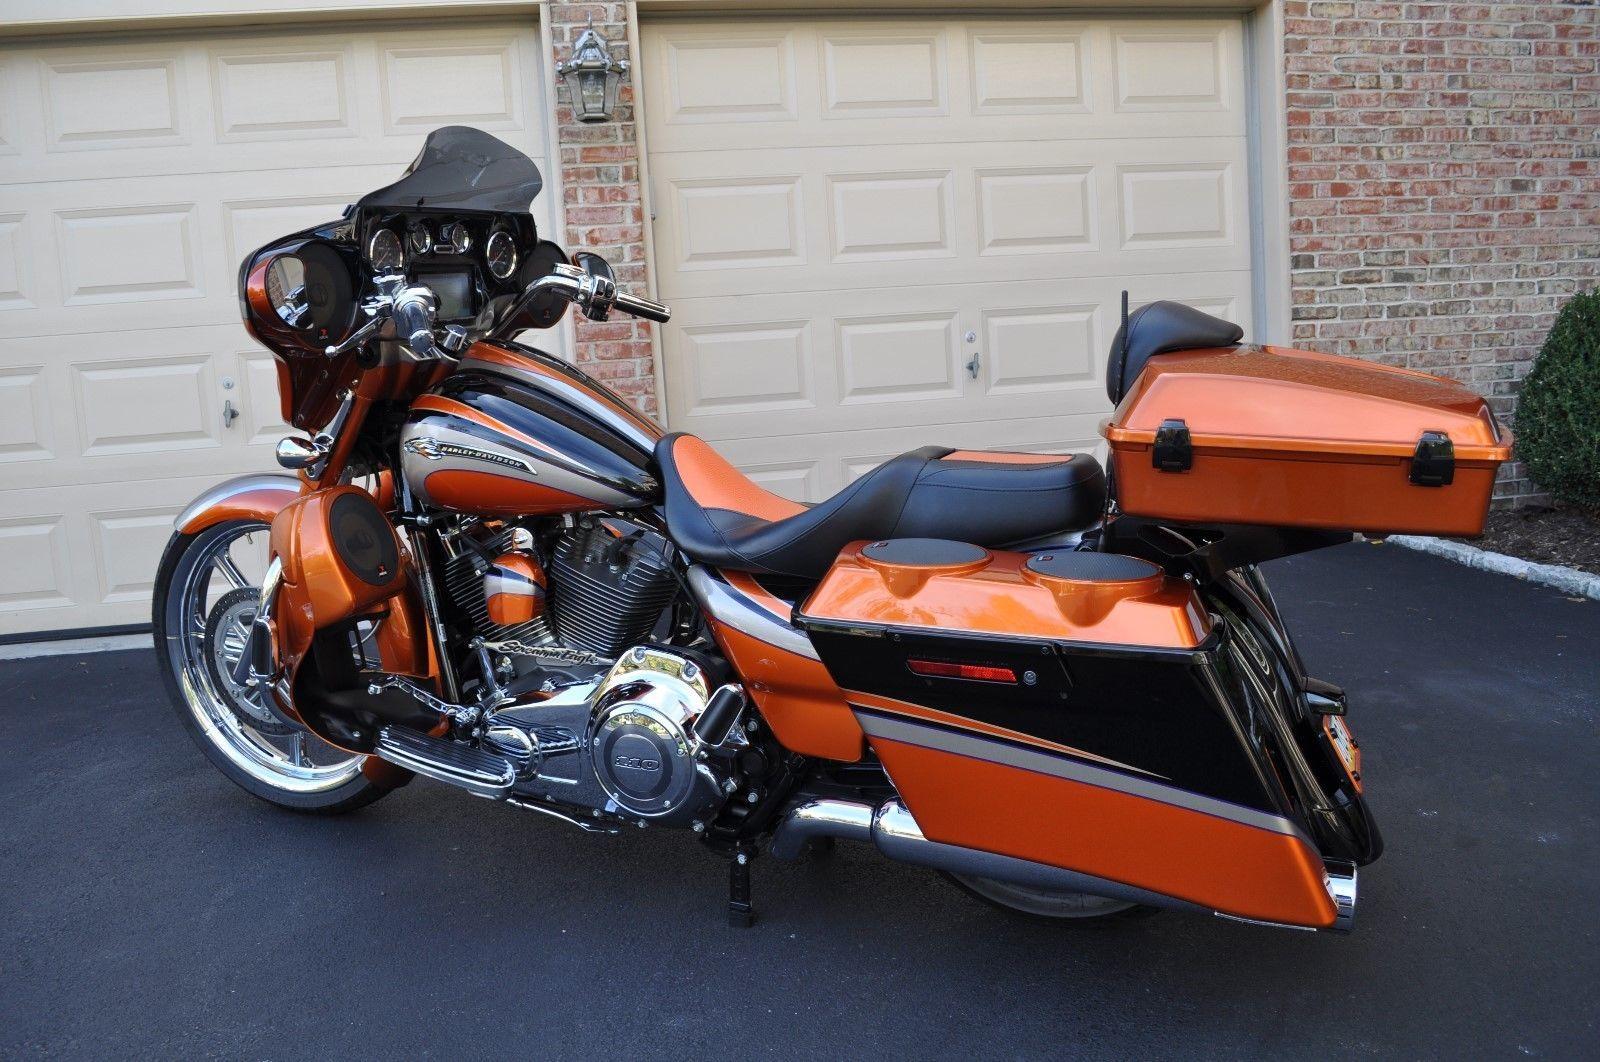 eBay: 2011 Harley-Davidson Touring Harley-Davidson CVO Street Glide Custom  Big Wheel